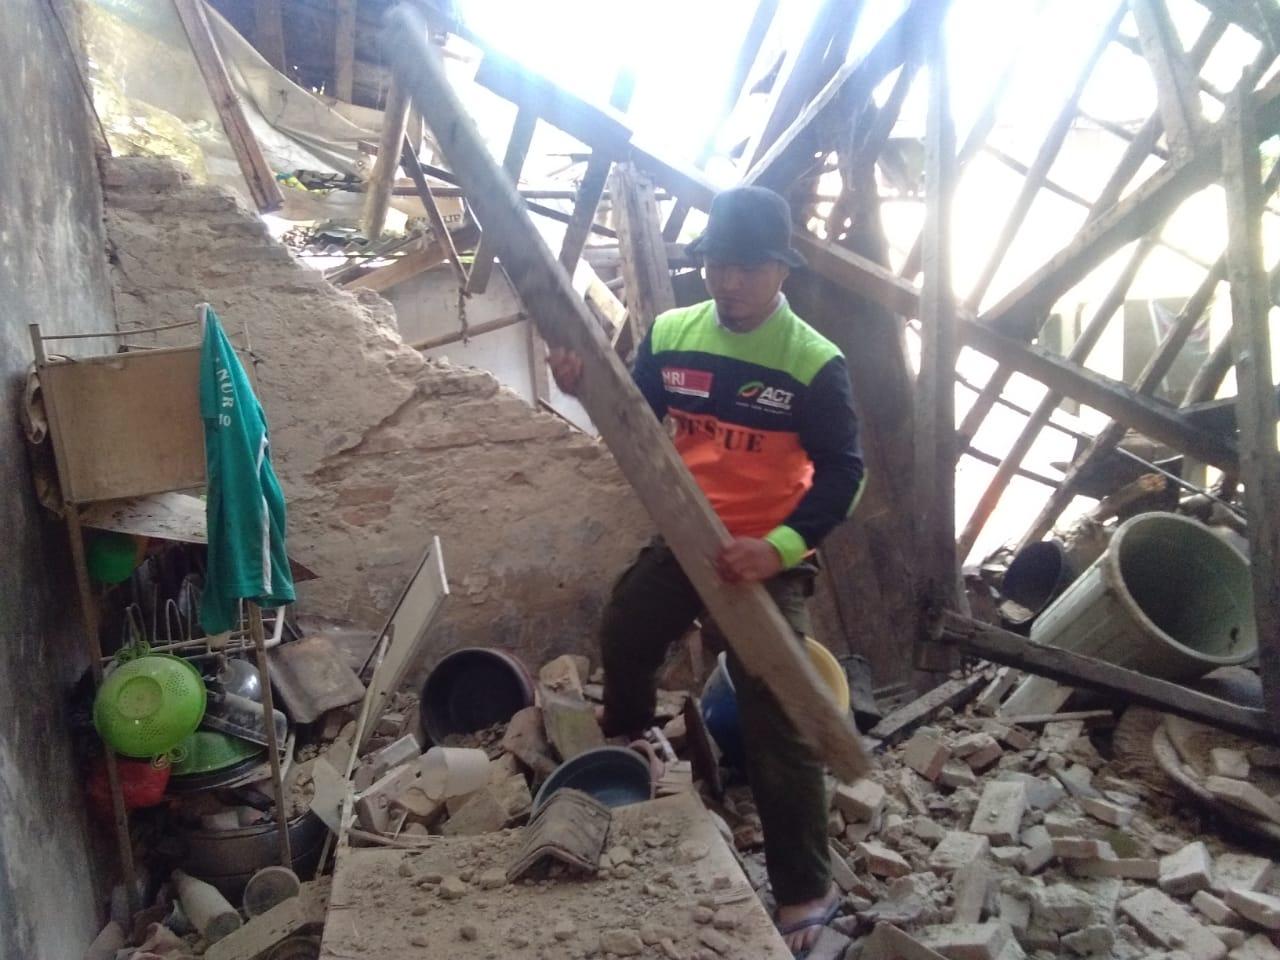 Bikin Bangga! Relawan Ini Bantu Korban Gempa Sejak Dini Hari